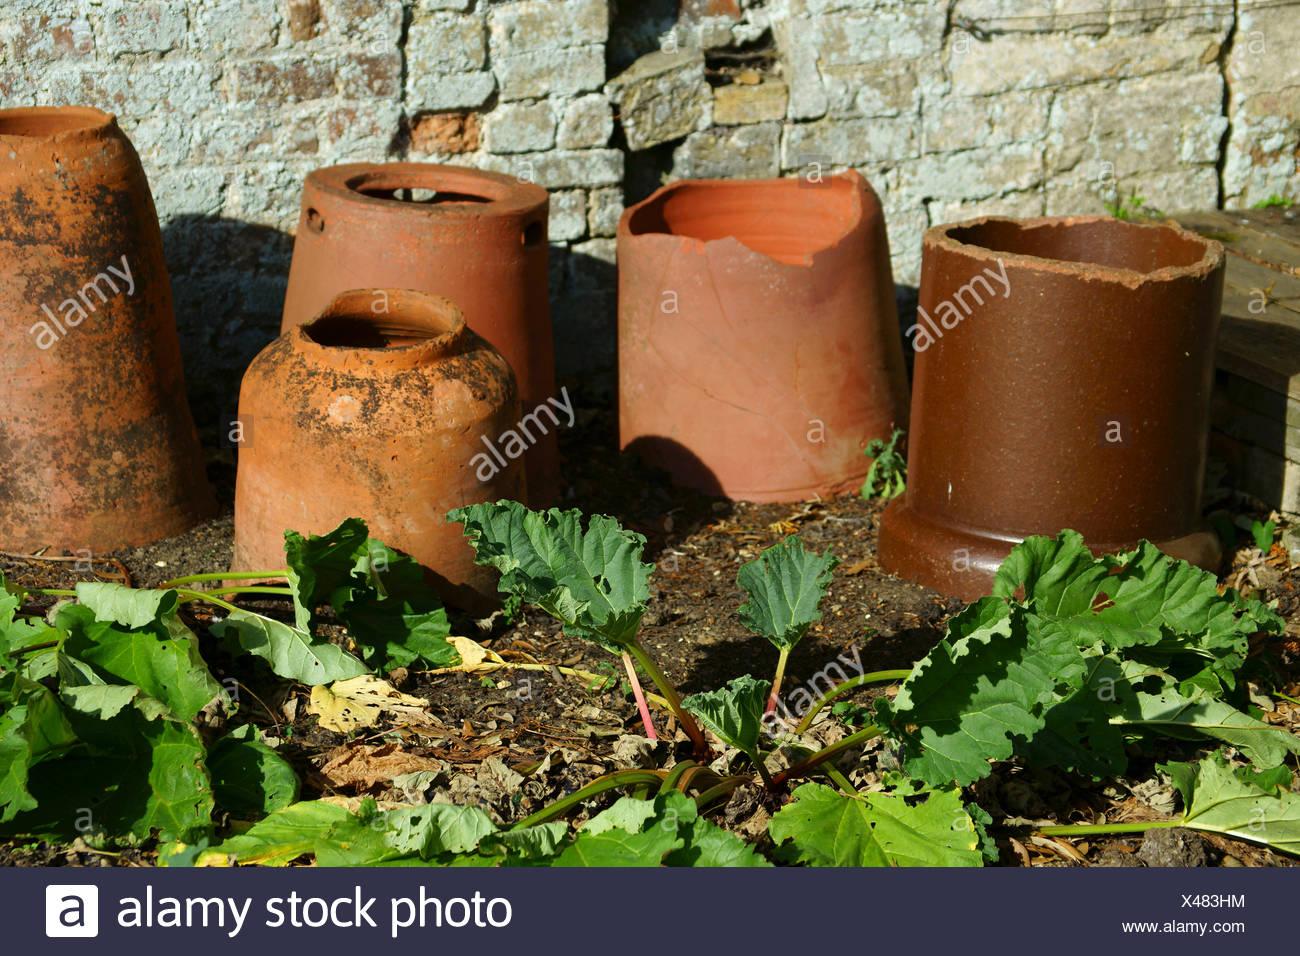 Rhubarb, Rheum rhabarbarum. - Stock Image